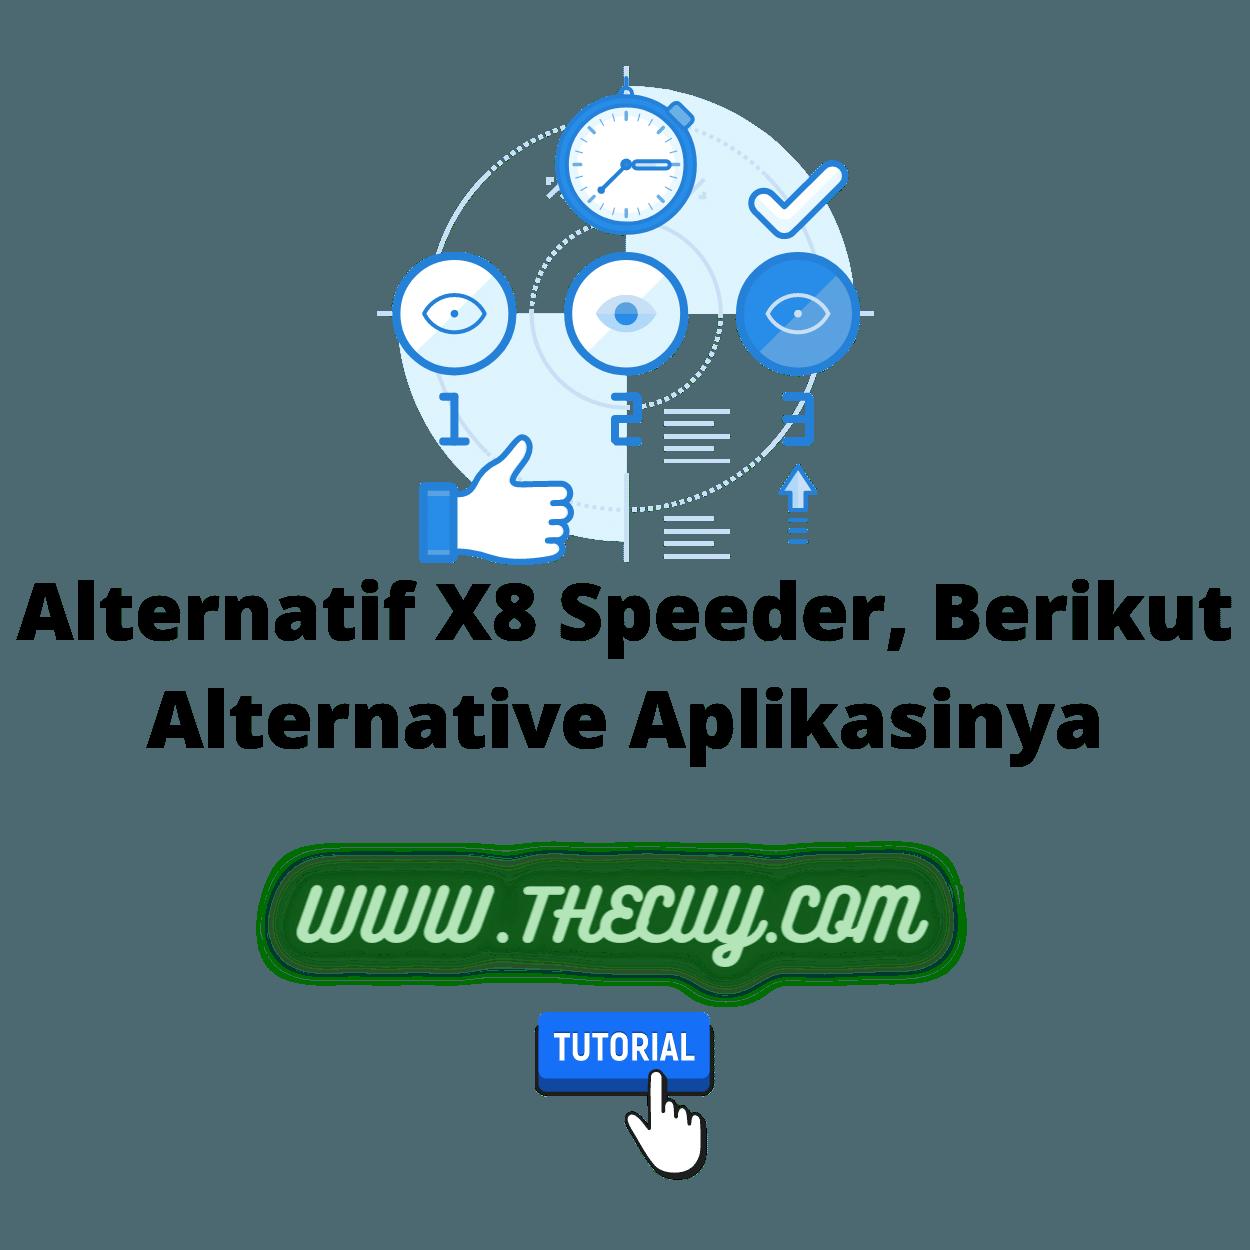 Alternatif X8 Speeder, Berikut Alternative Aplikasinya